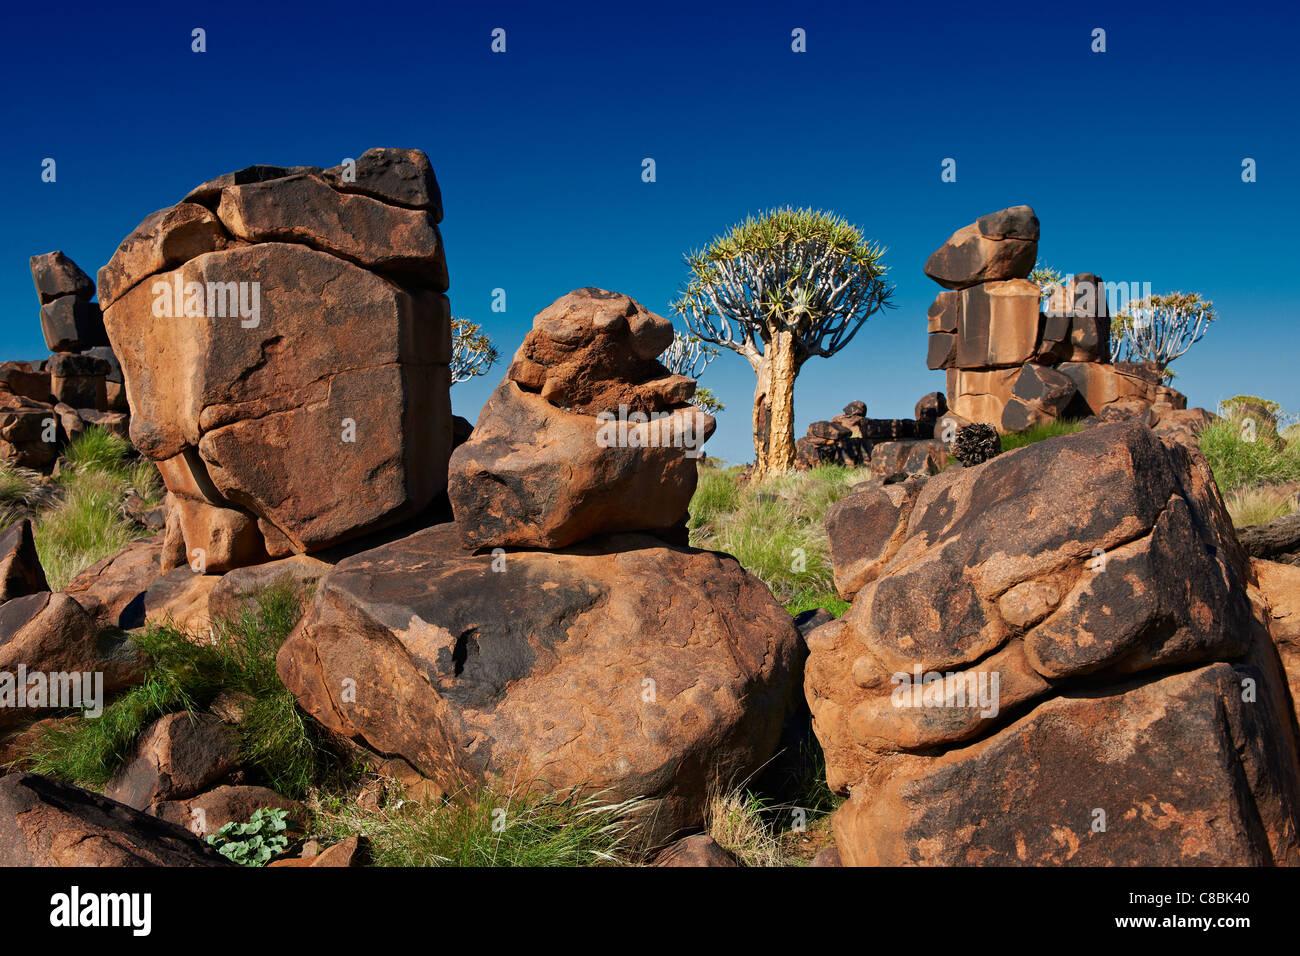 Per Quiver tree forest, Aloe dichotoma, Azienda Agricola Garas, Mesosaurus Sito fossile, Keetmanshoop, Namibia, Immagini Stock